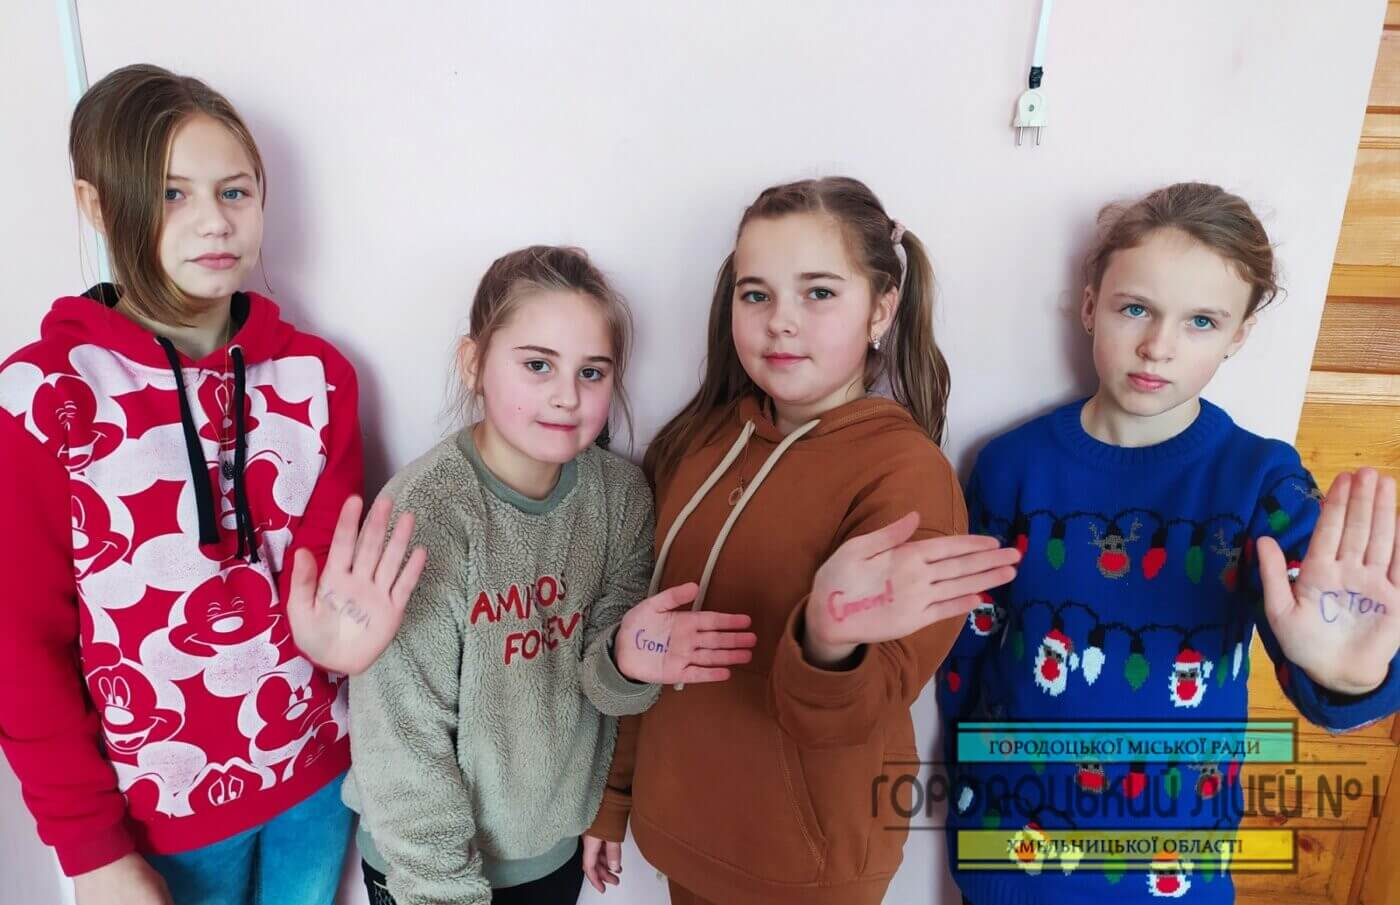 zobrazhennya viber 2020 12 09 21 13 233 1400x905 - Діти проти насилля